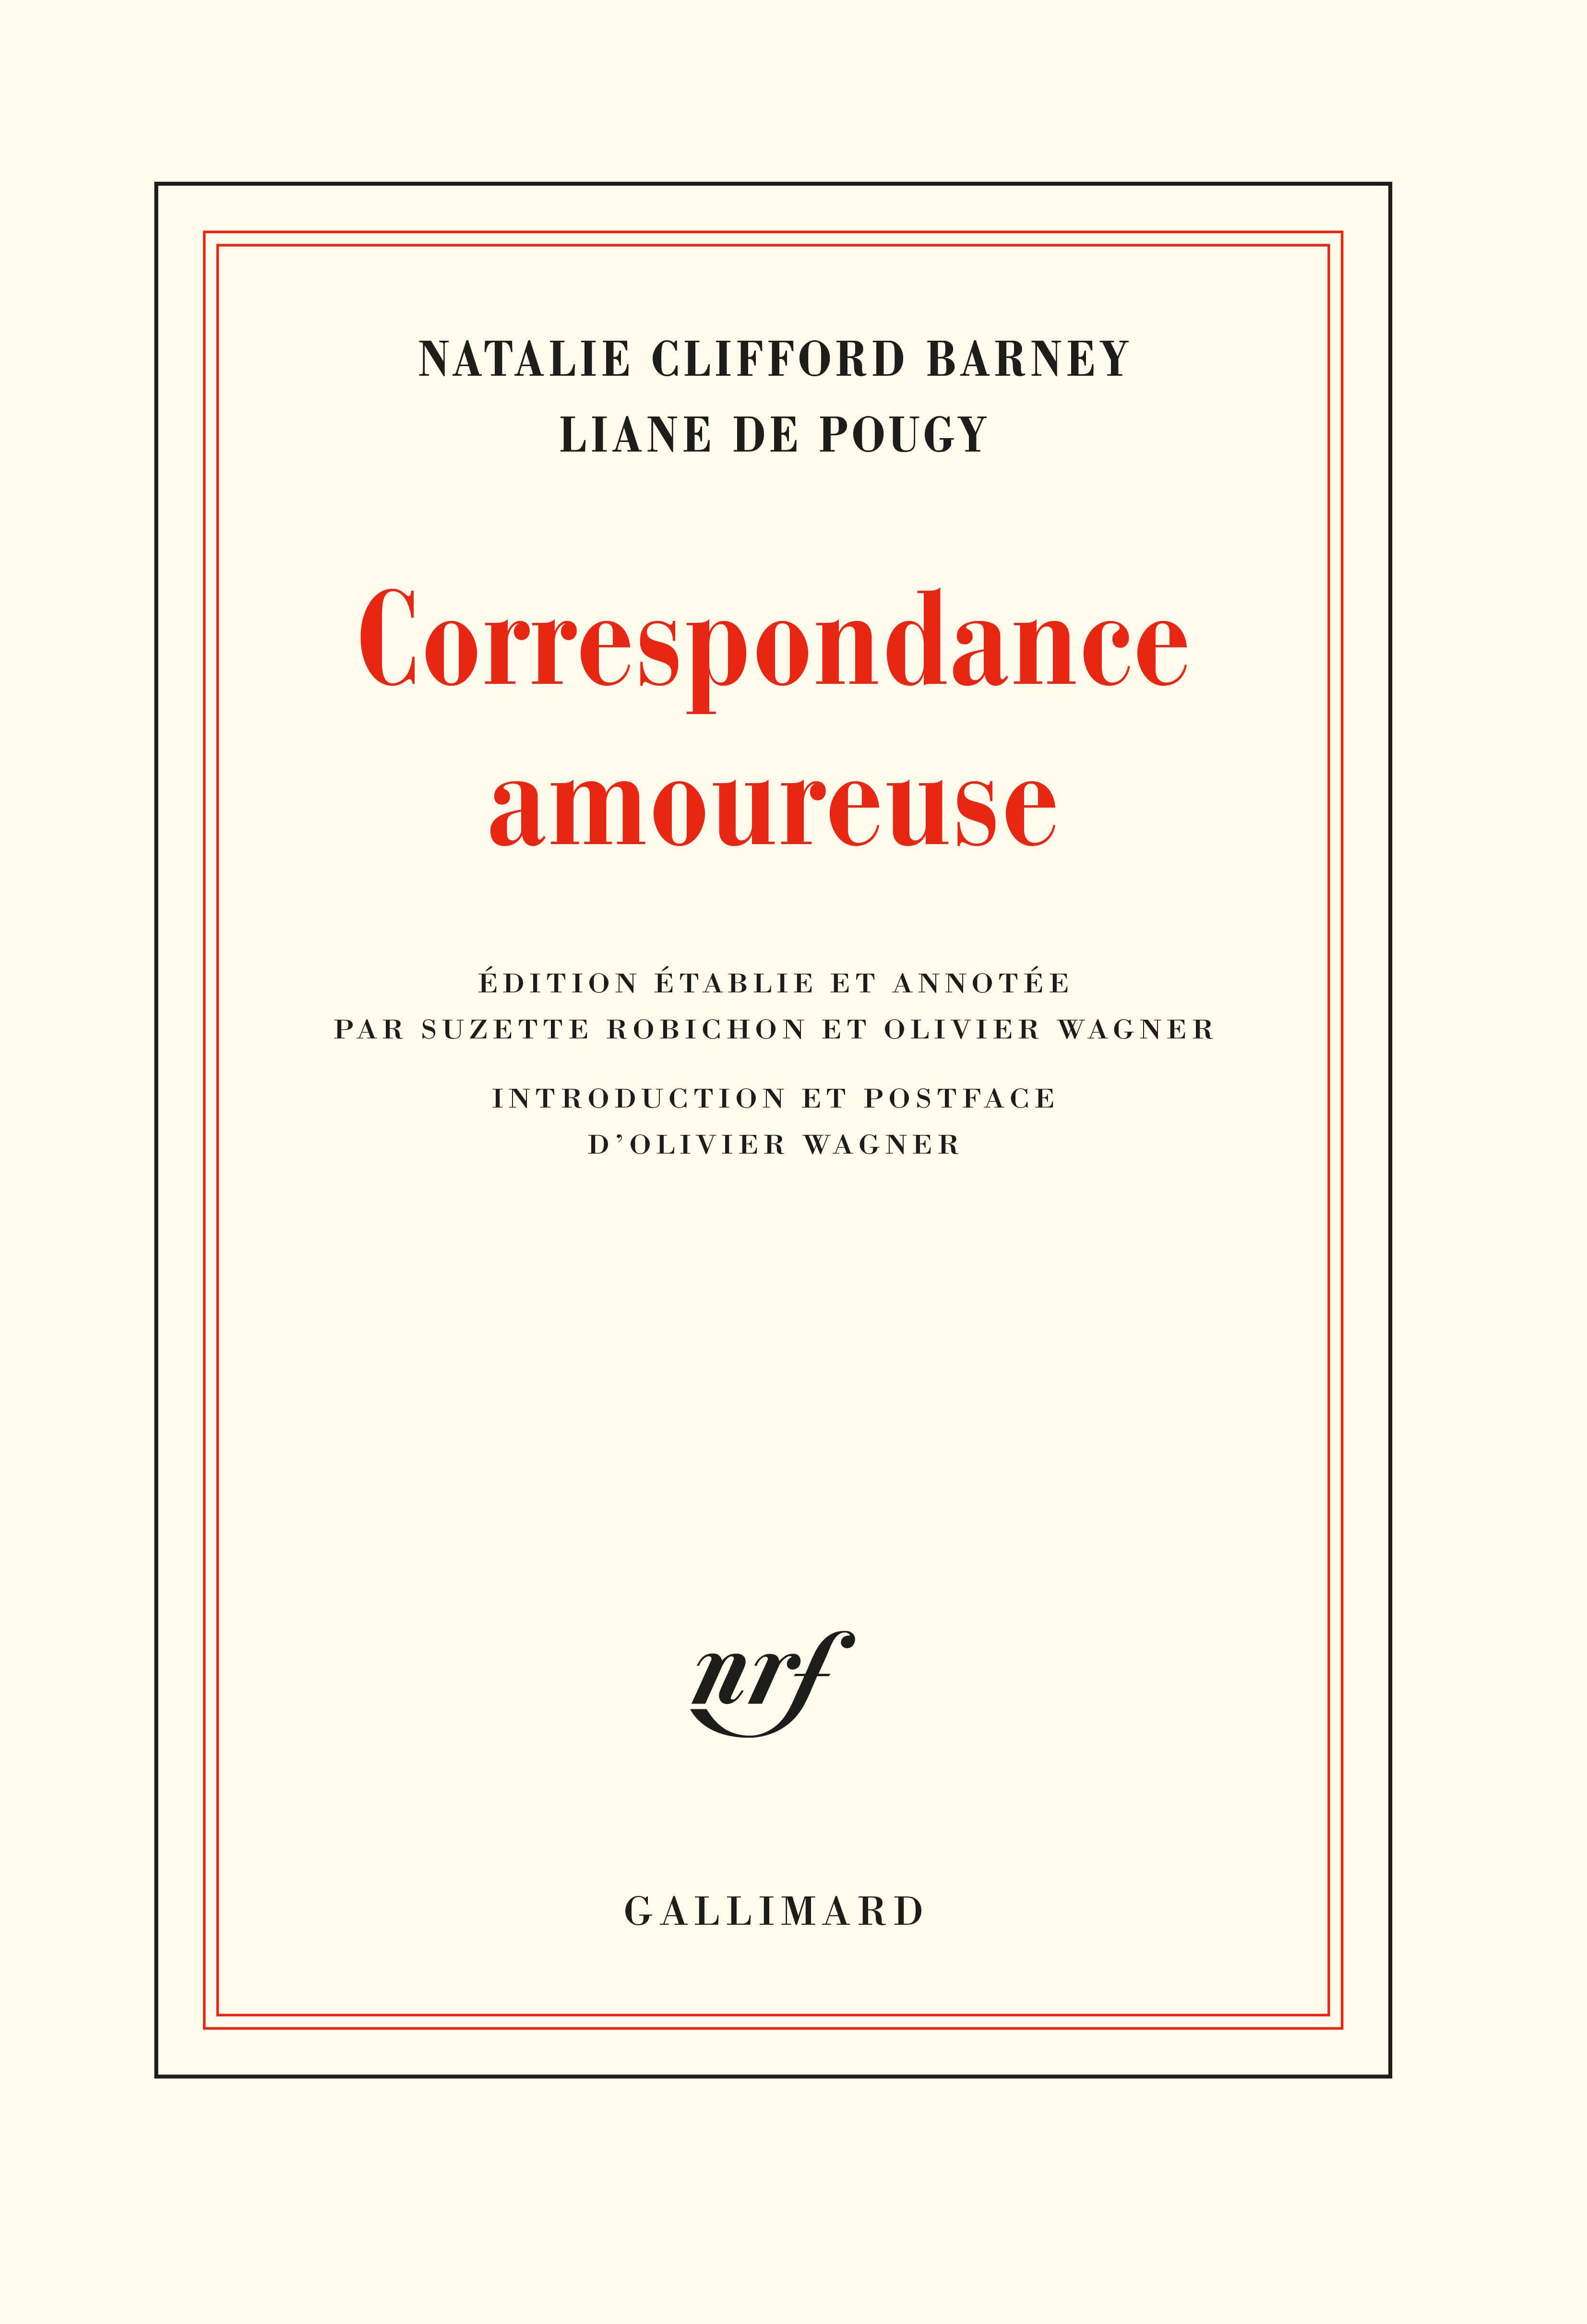 CORRESPONDANCE AMOUREUSE